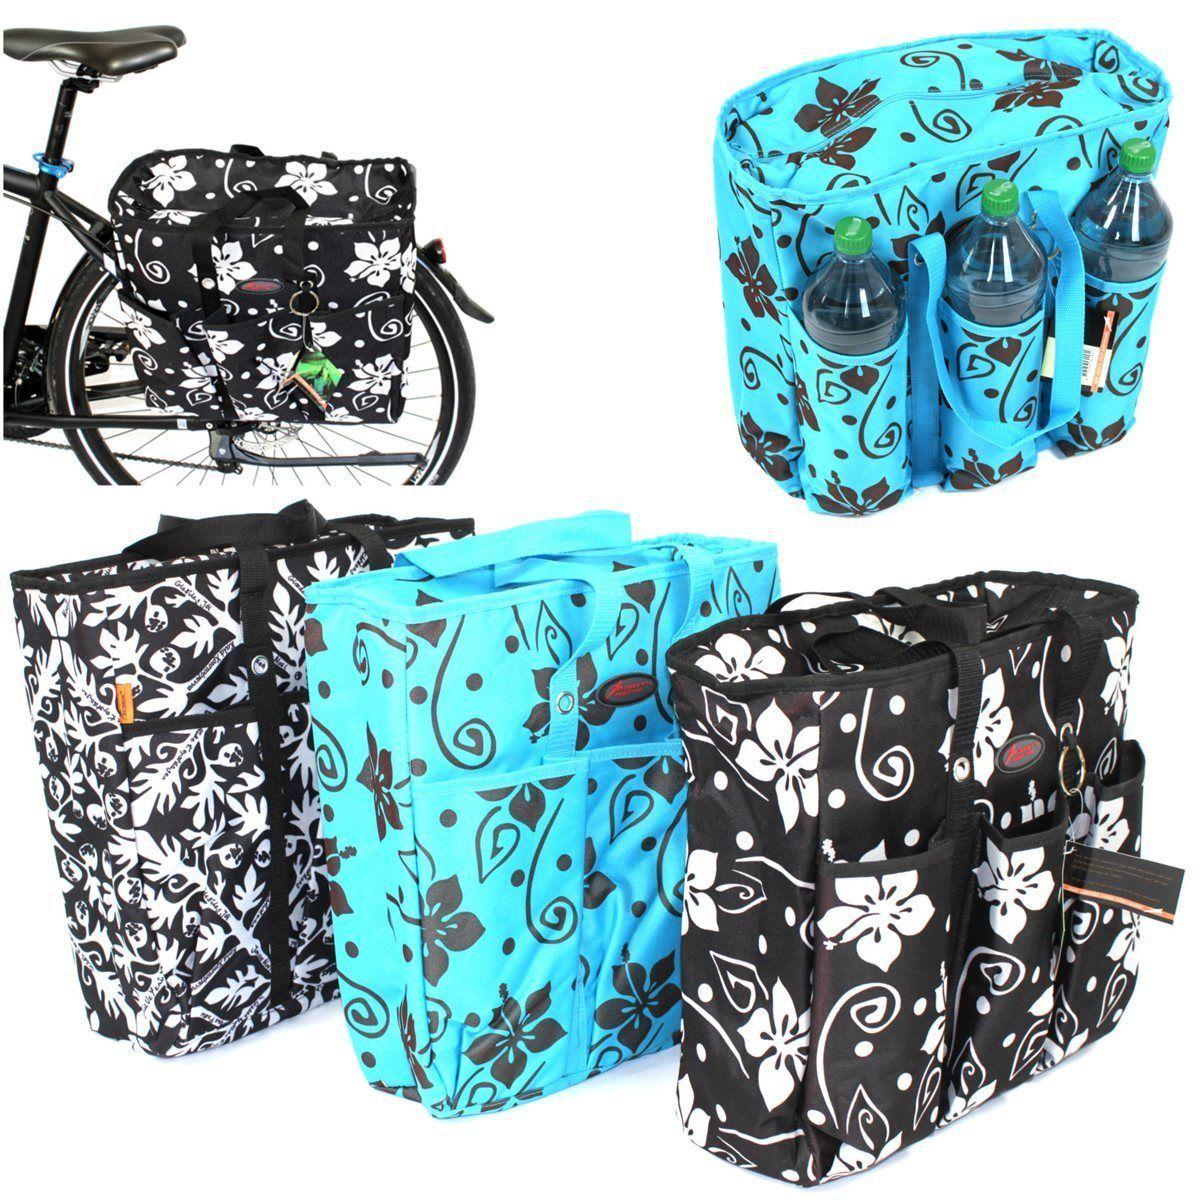 fahrradtasche k hltasche gep cktr ger tasche fahrrad k hltasche gep cktasche in sport radsport. Black Bedroom Furniture Sets. Home Design Ideas